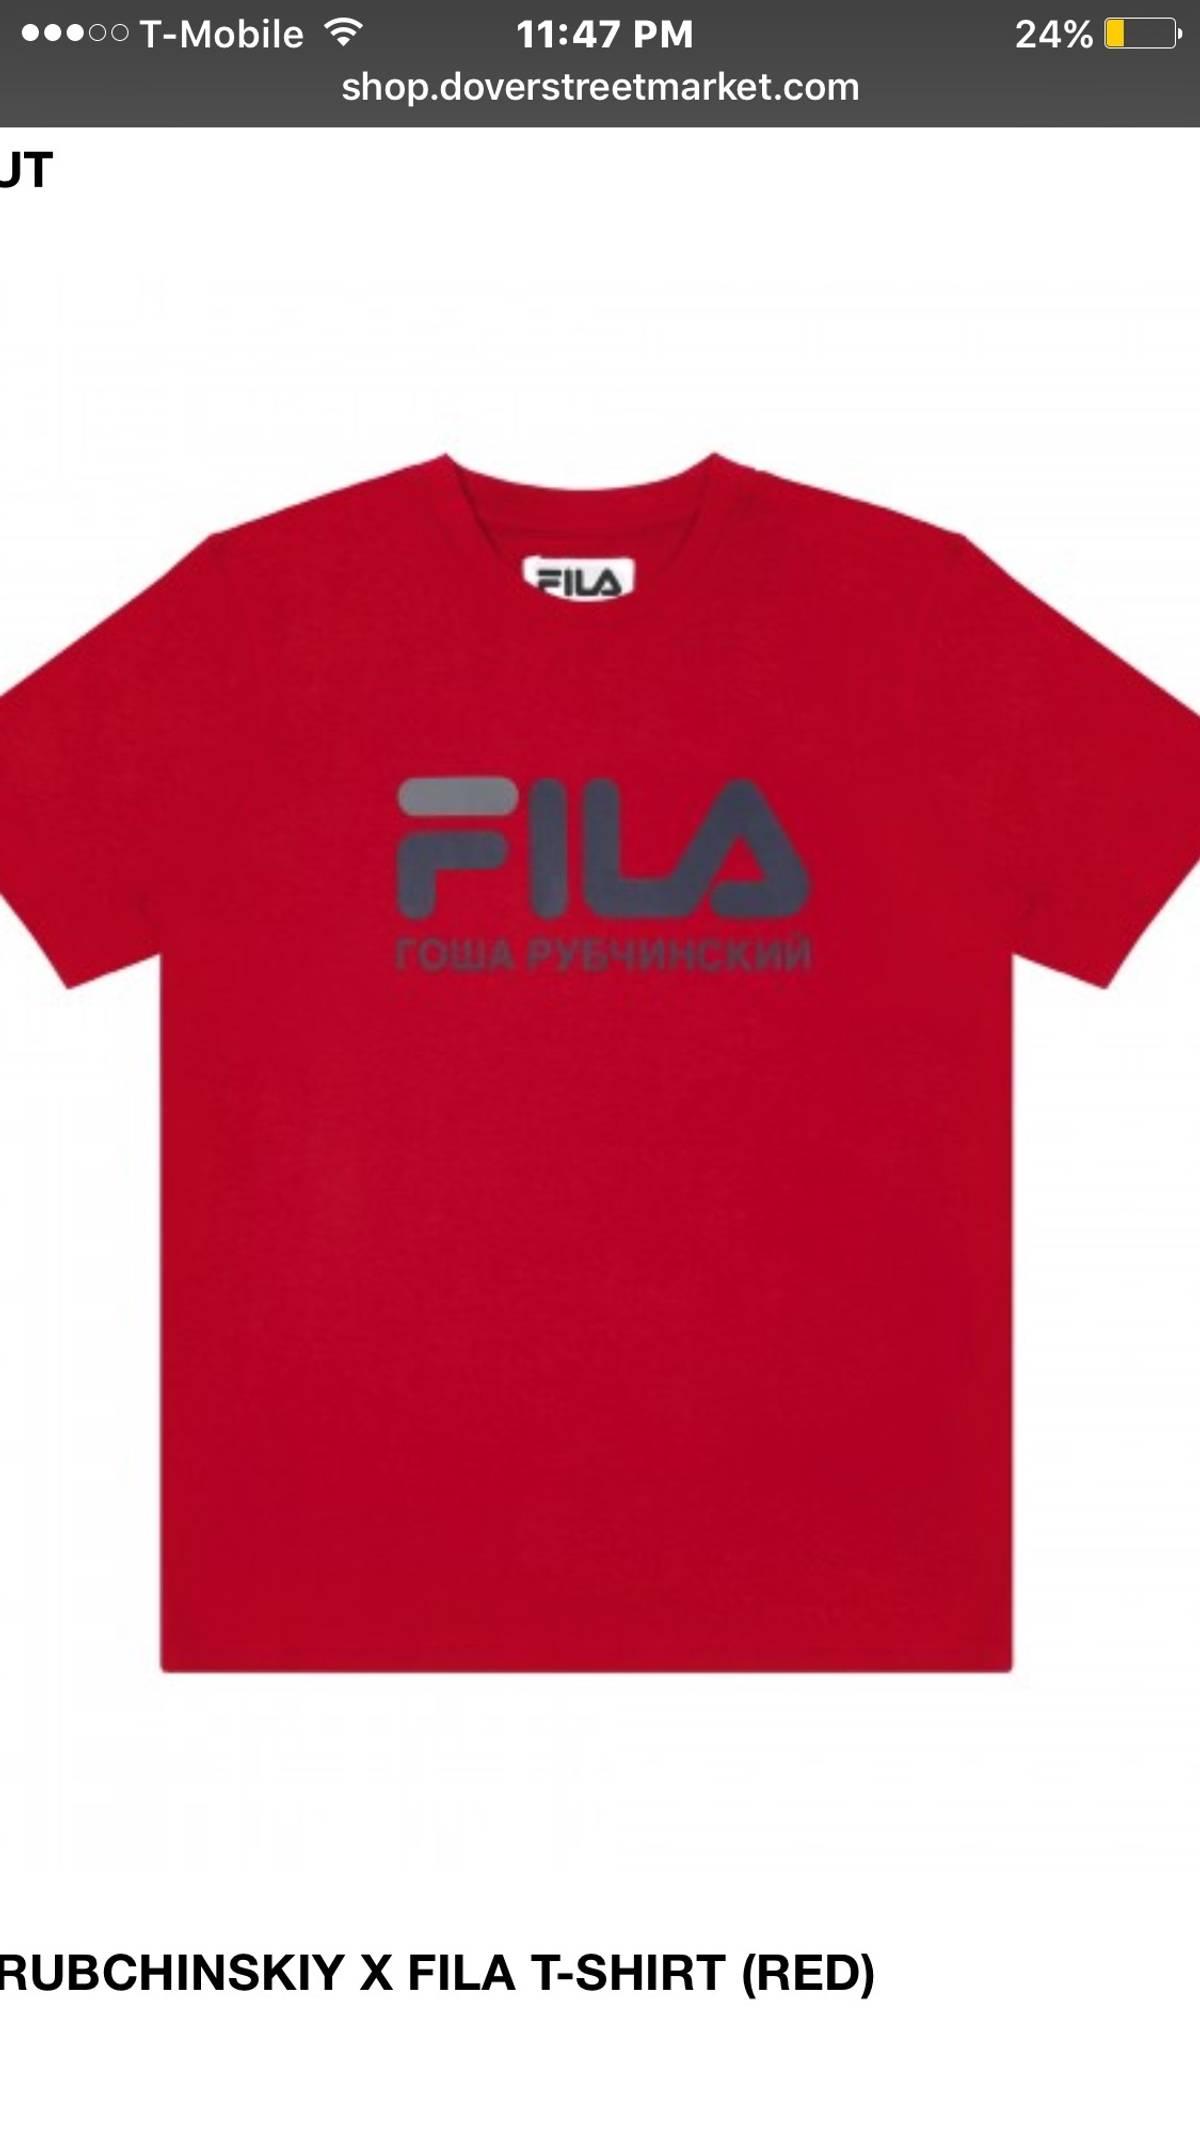 1cb573423fec Gosha Rubchinskiy × Fila ×. Gosha X Fila T Shirt